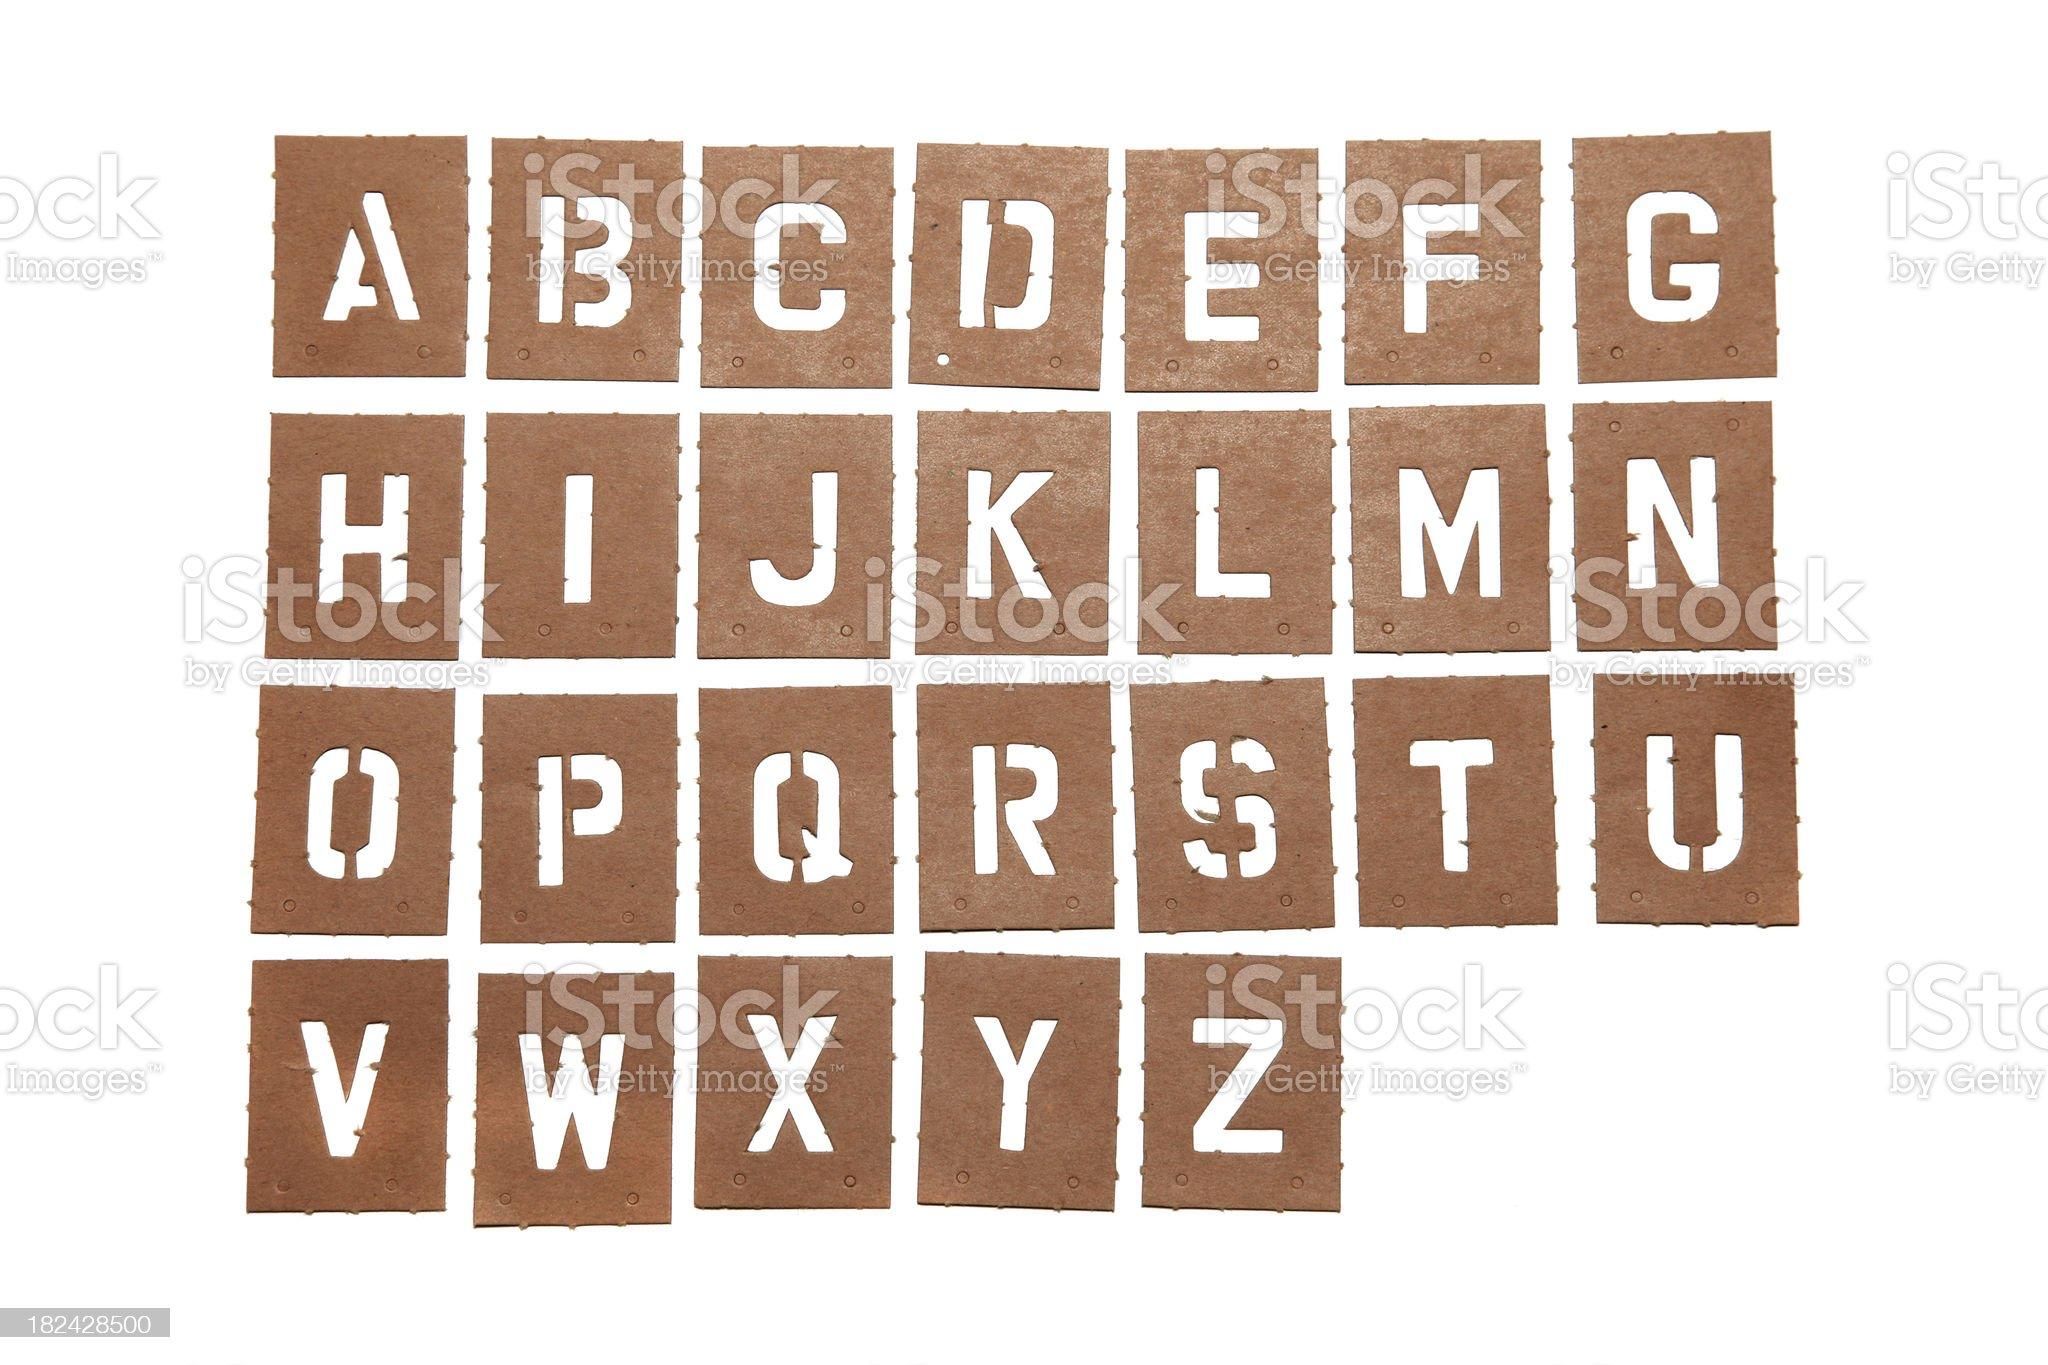 Alphabet Stencil Word royalty-free stock photo